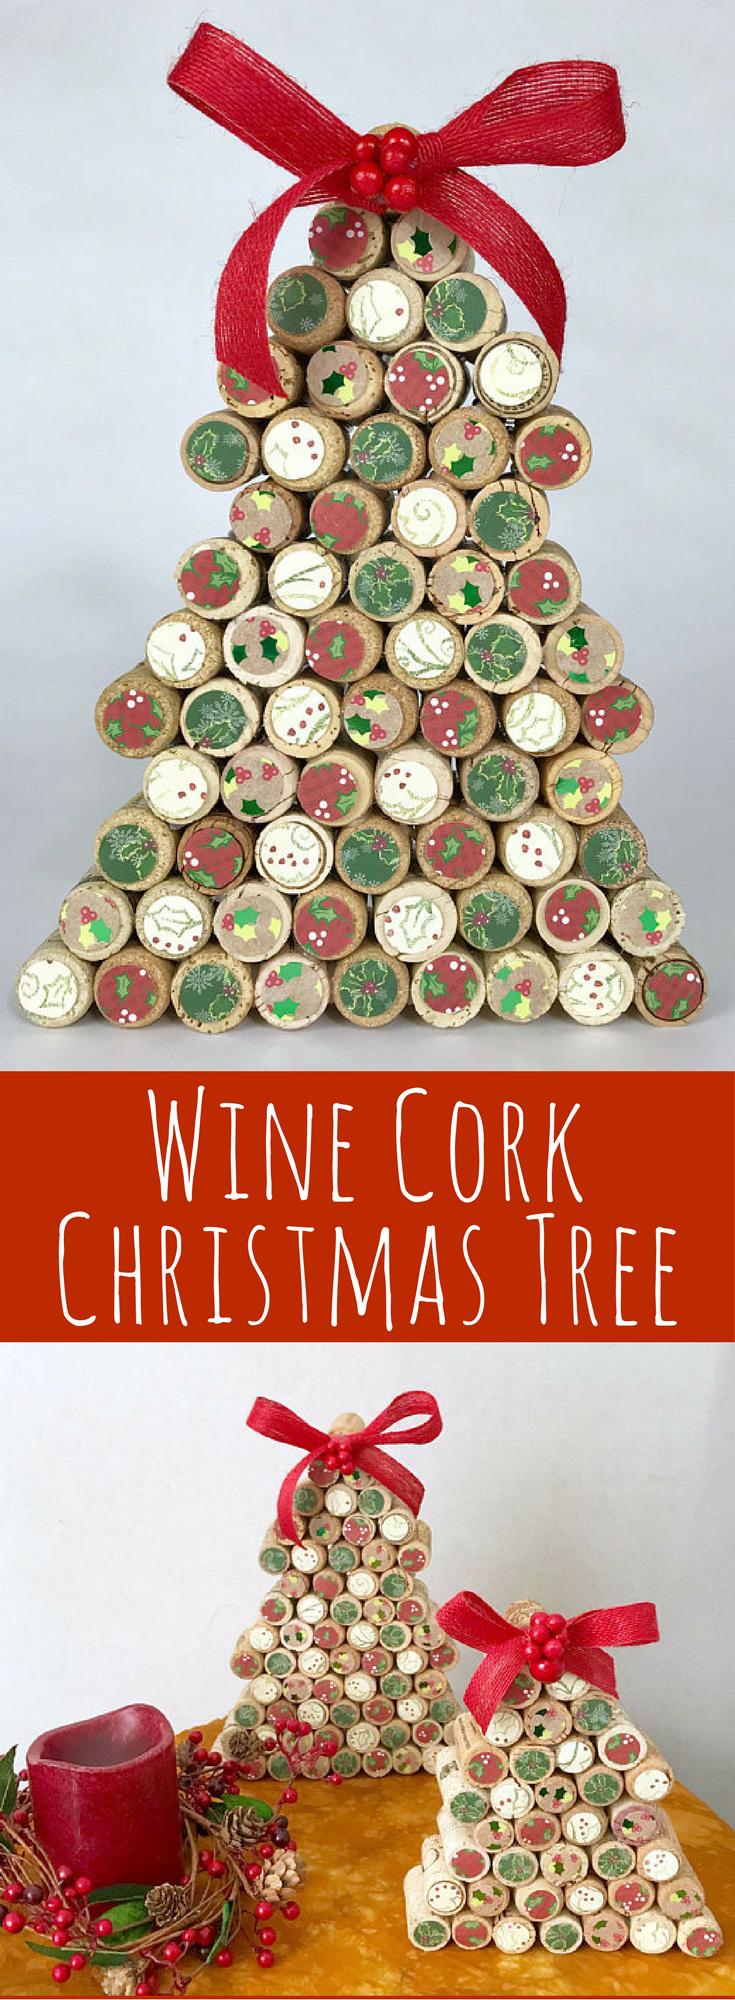 Wine Cork Christmas Tree Country Handmade Rustic Decor